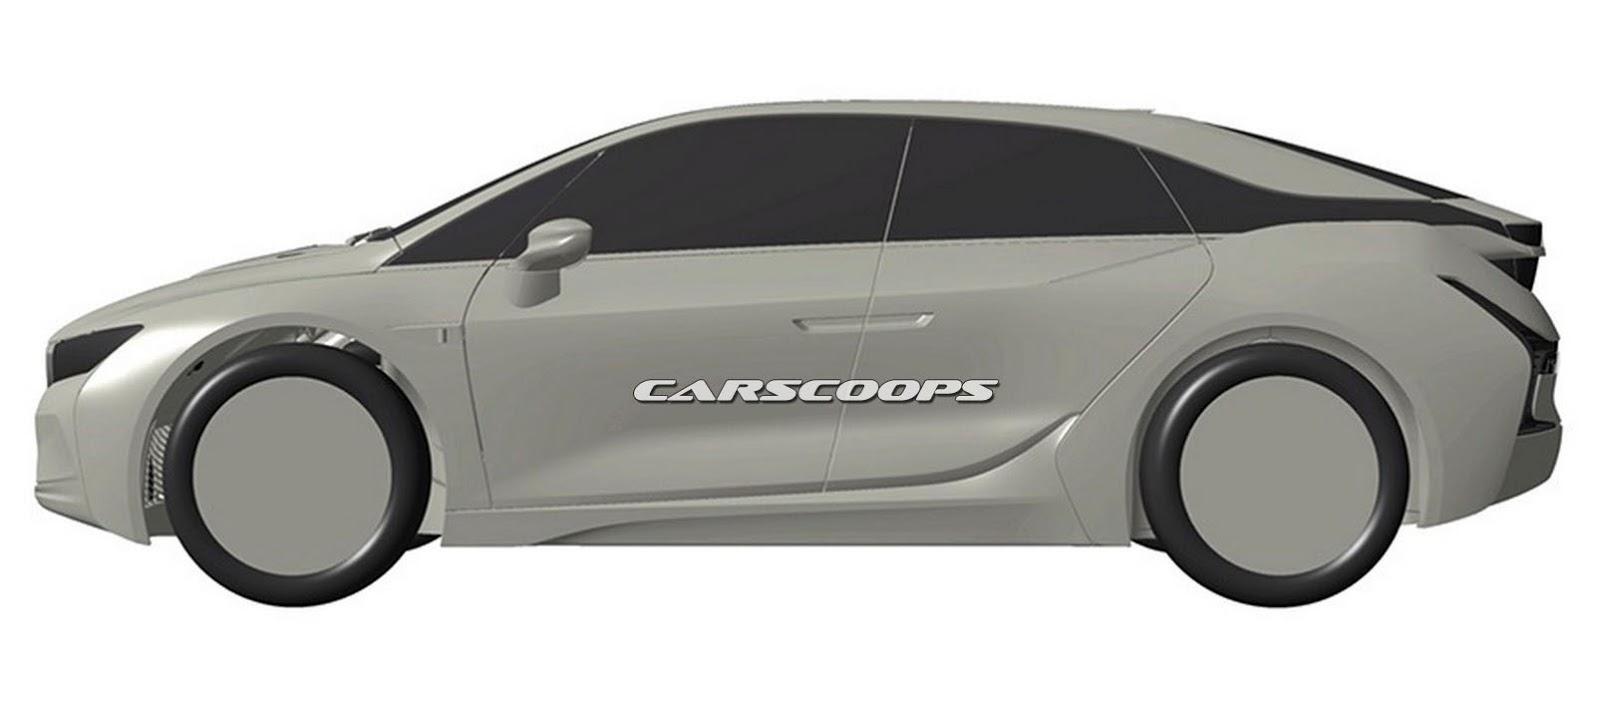 BMW i5 SUV (rendering)